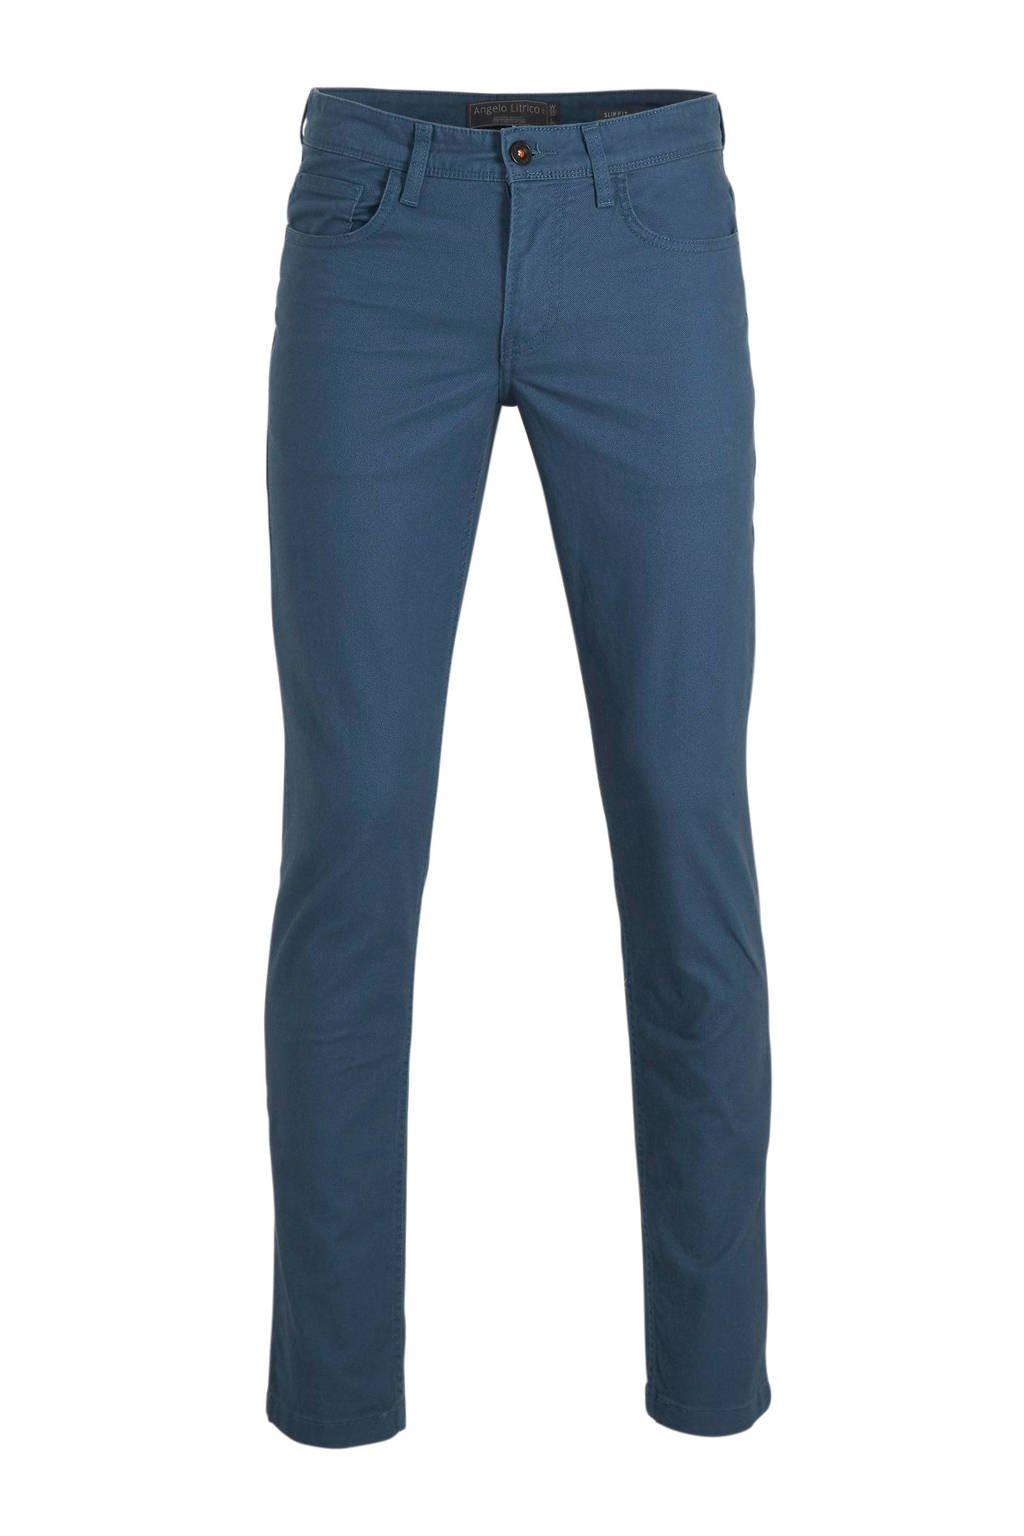 C&A Angelo Litrico slim fit jeans petrol, Petrol